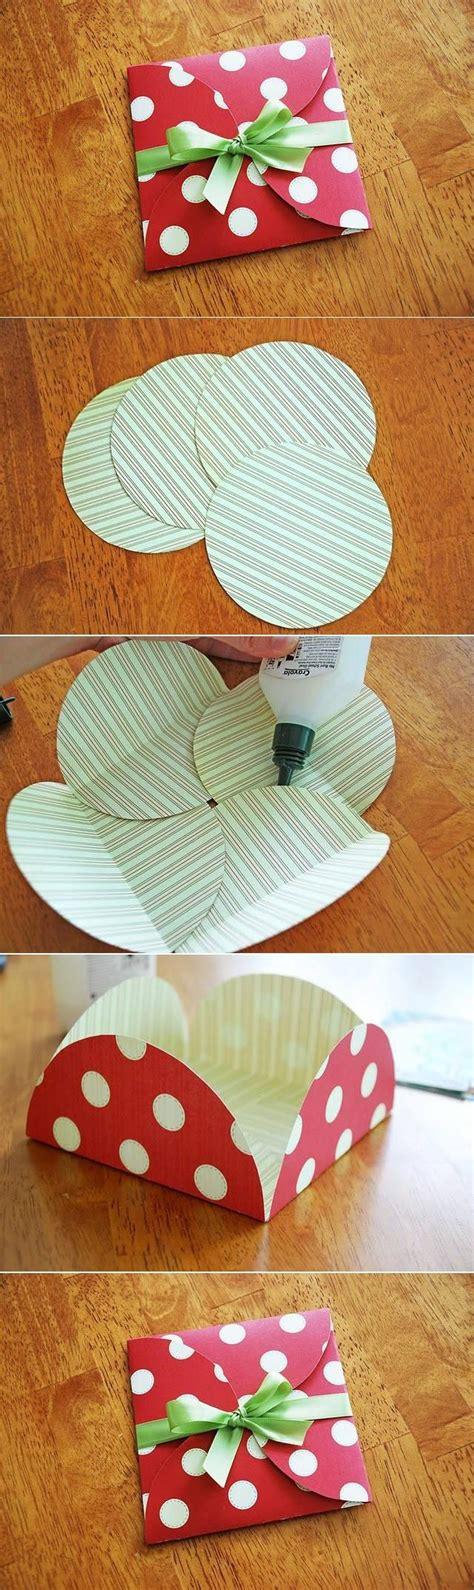 diy crafts diy craft simple beautiful envelope diy crafts